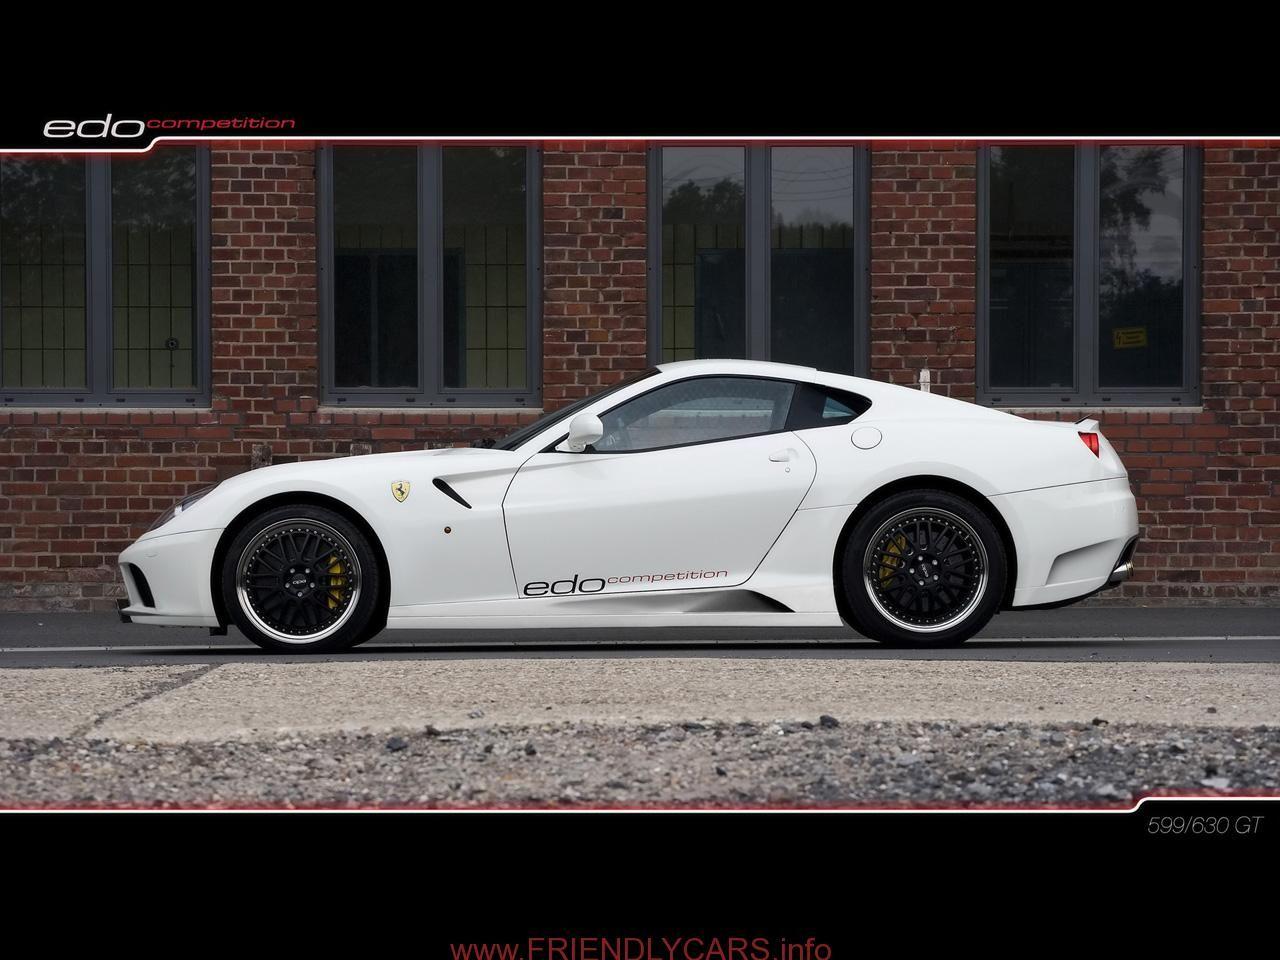 Cool Ferrari Enzo White And Black Car Images Hd White Ferrari Enzo